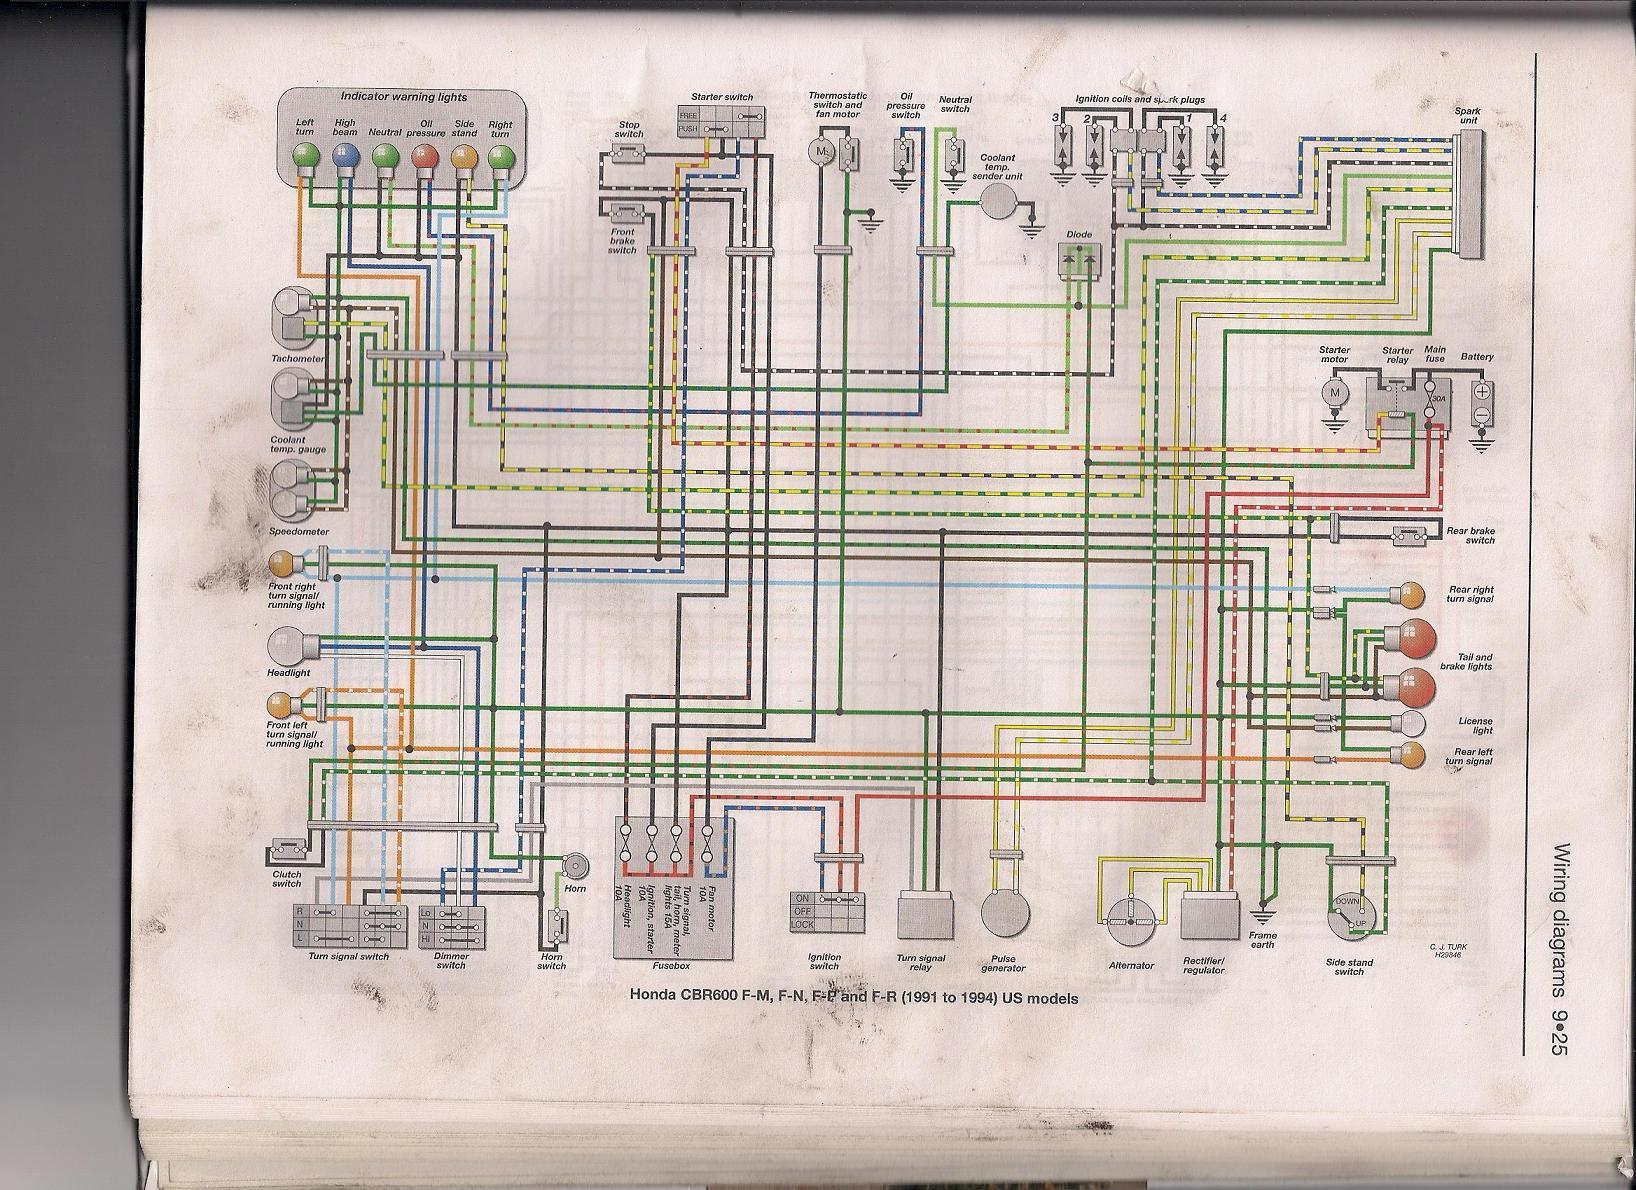 cbr 600 f4i wiring diagram studio lighting for stator get free image